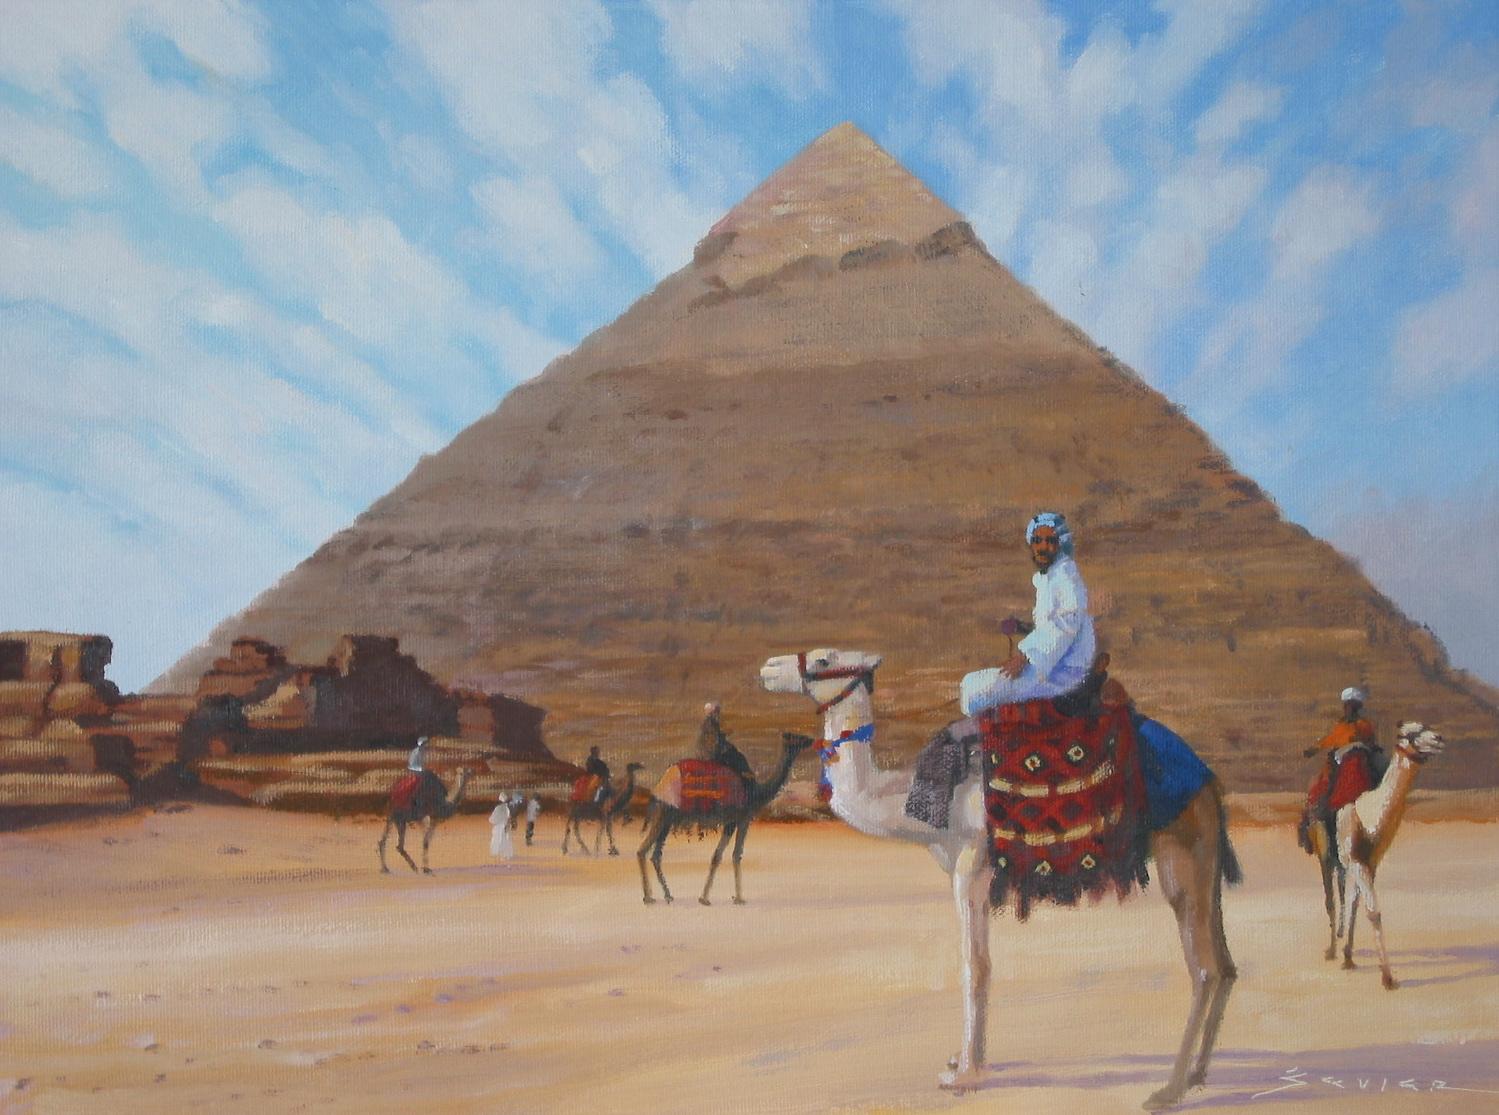 Khafre/Giza, 12 x 16, oil